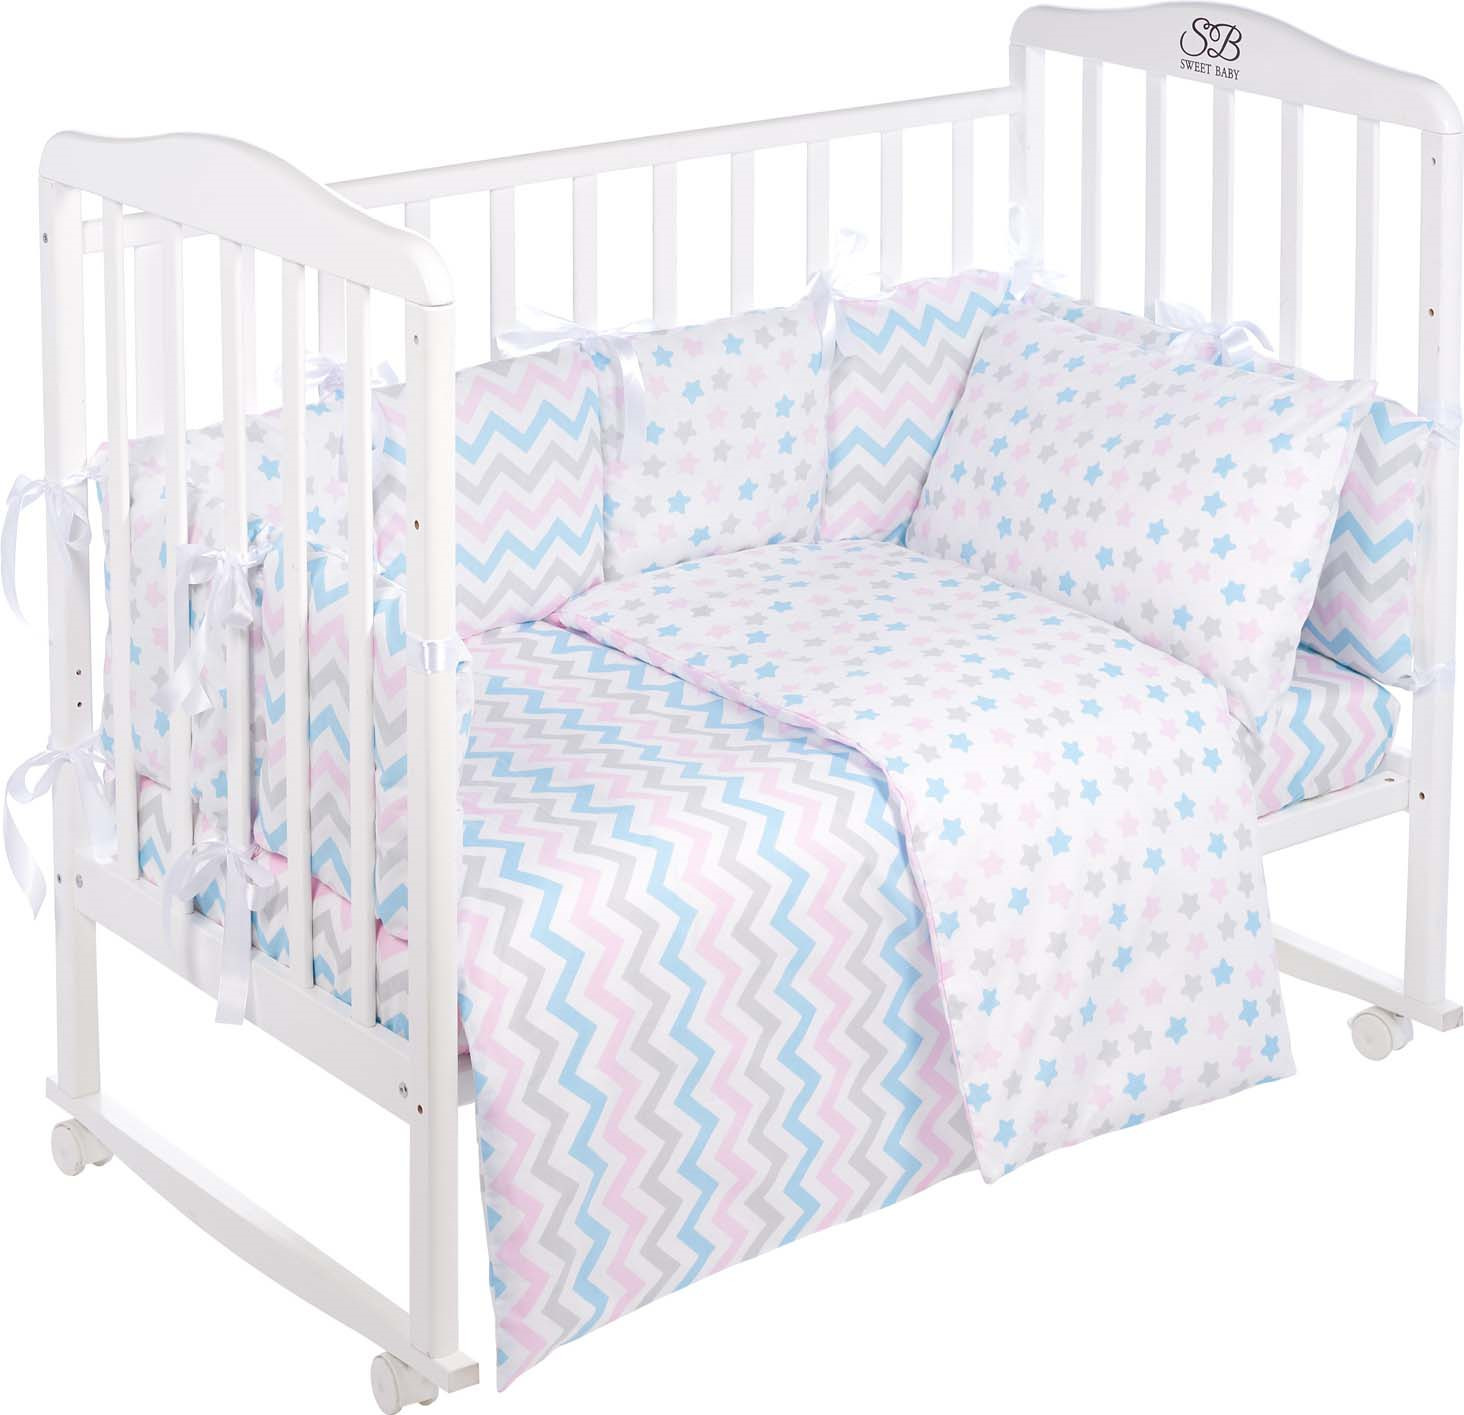 Комплект в кроватку Sweet Baby Anastasia, 419242, белый, 4 предмета